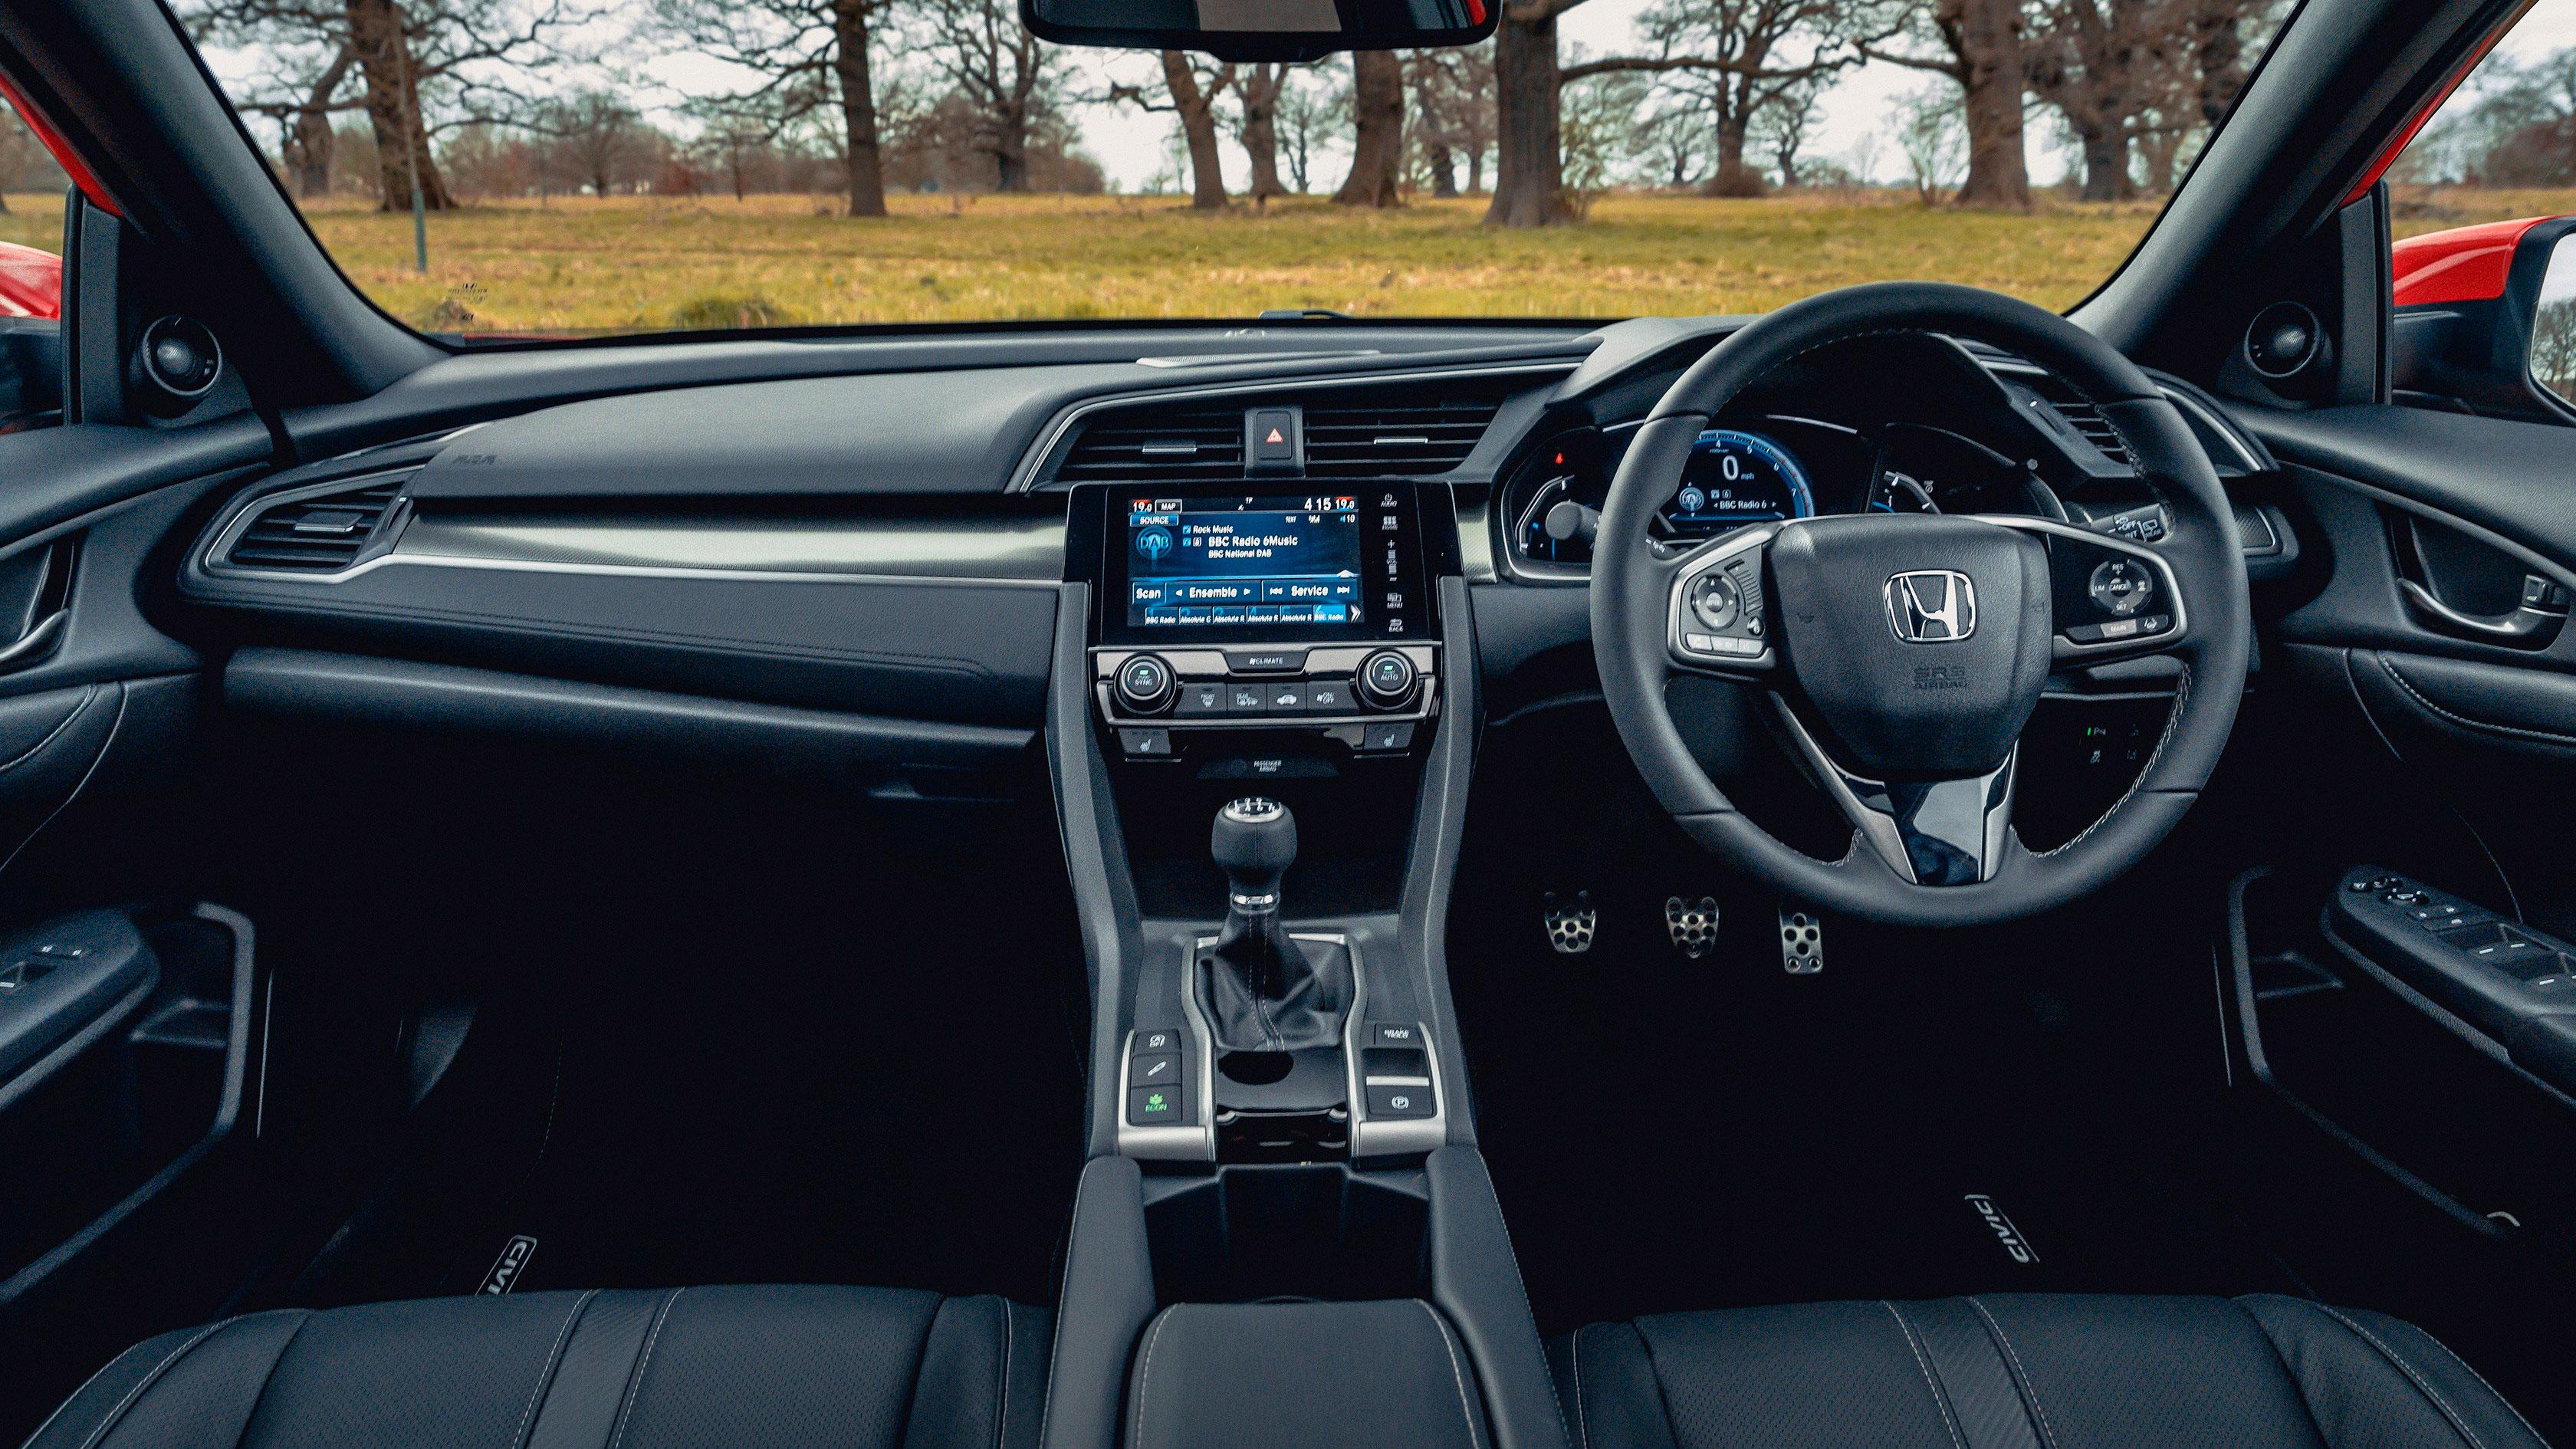 Honda Civic 1.0 vtec turbo interior